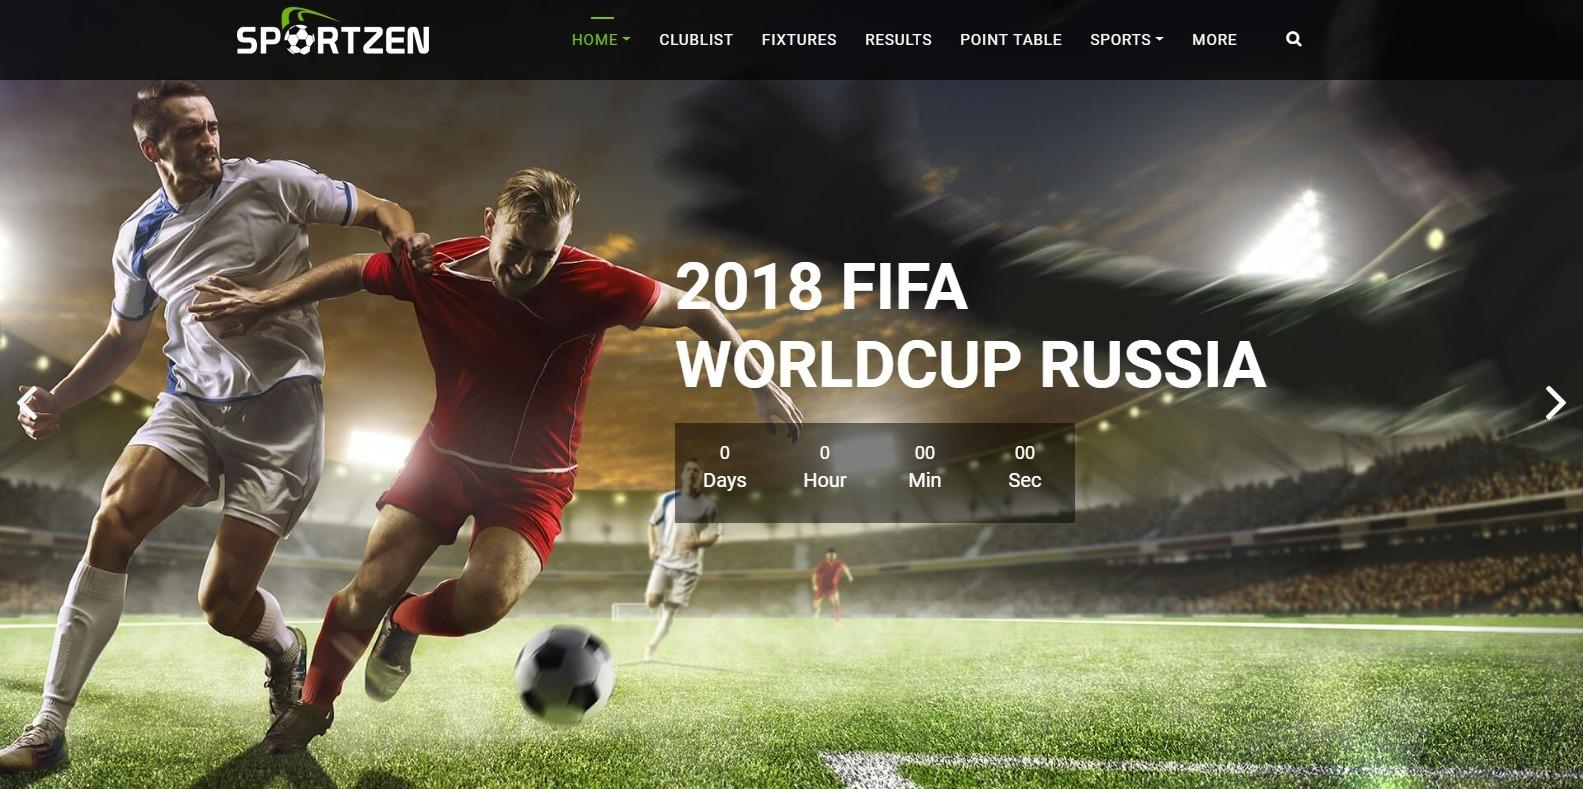 sportzen-sports-website-template